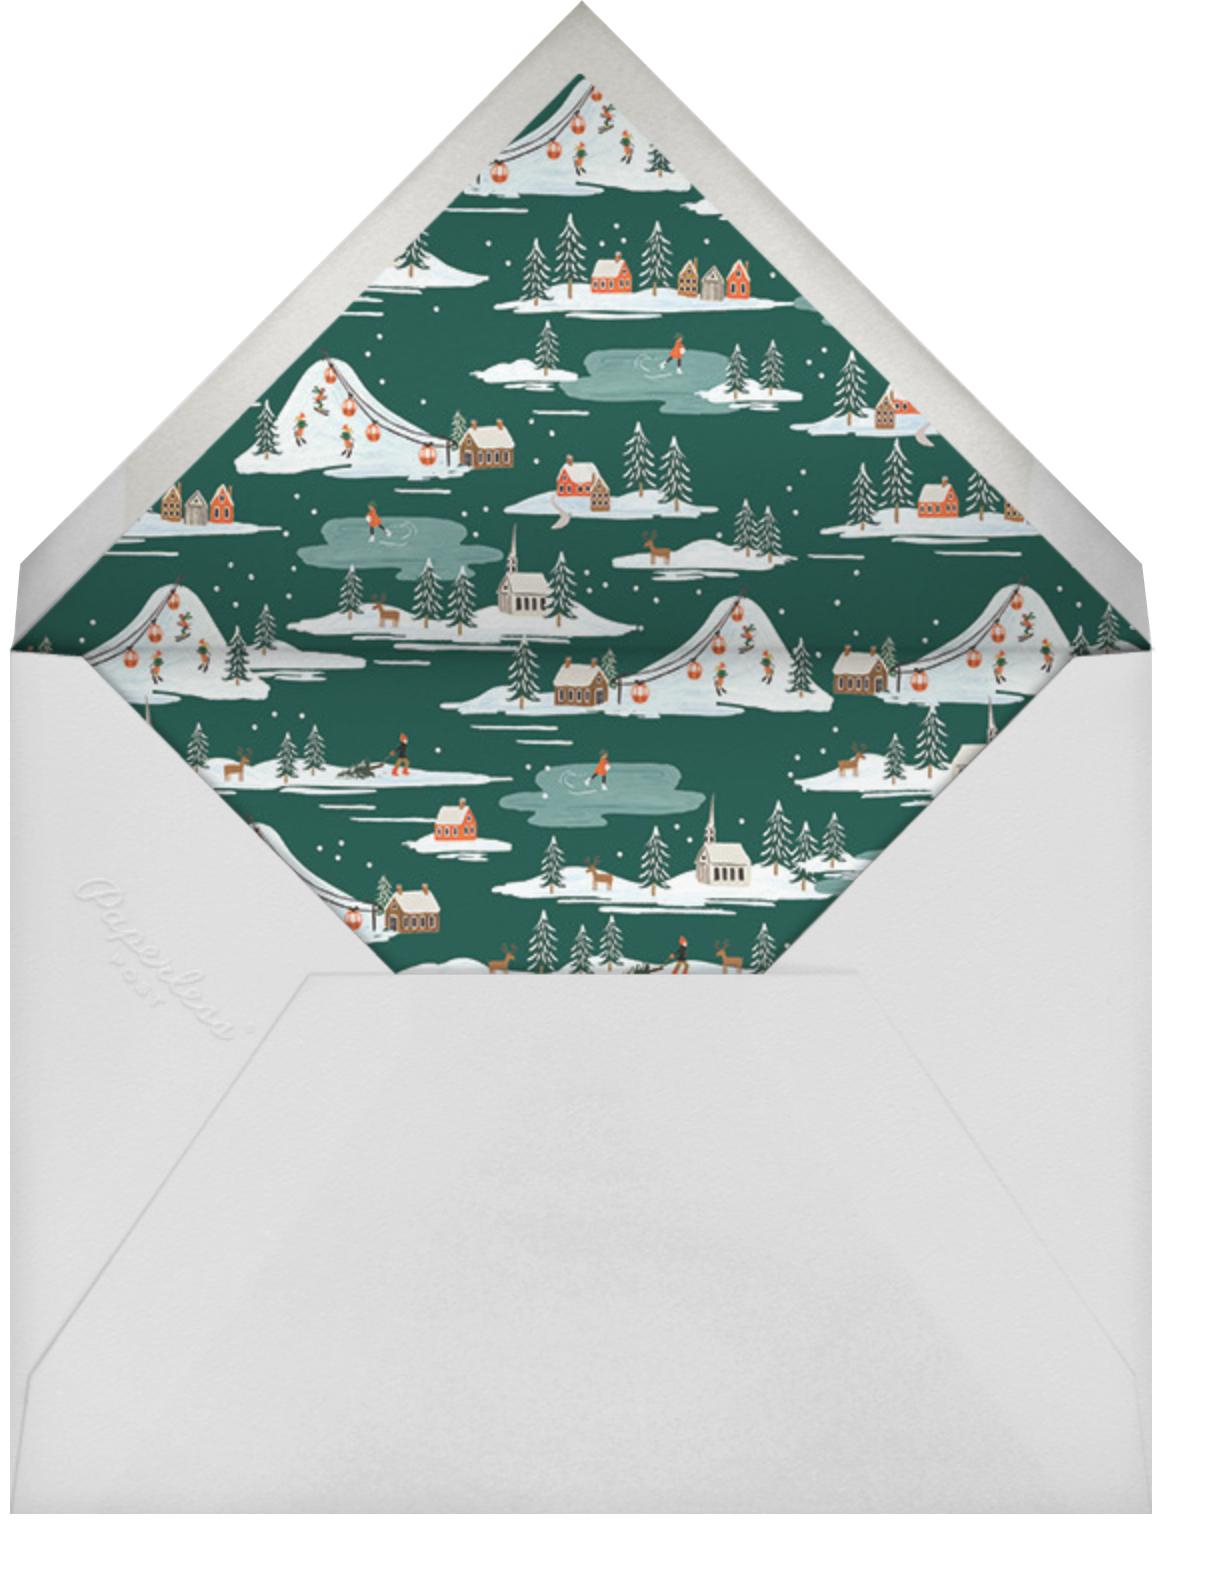 Global Citizen - Light - Rifle Paper Co. - Envelope